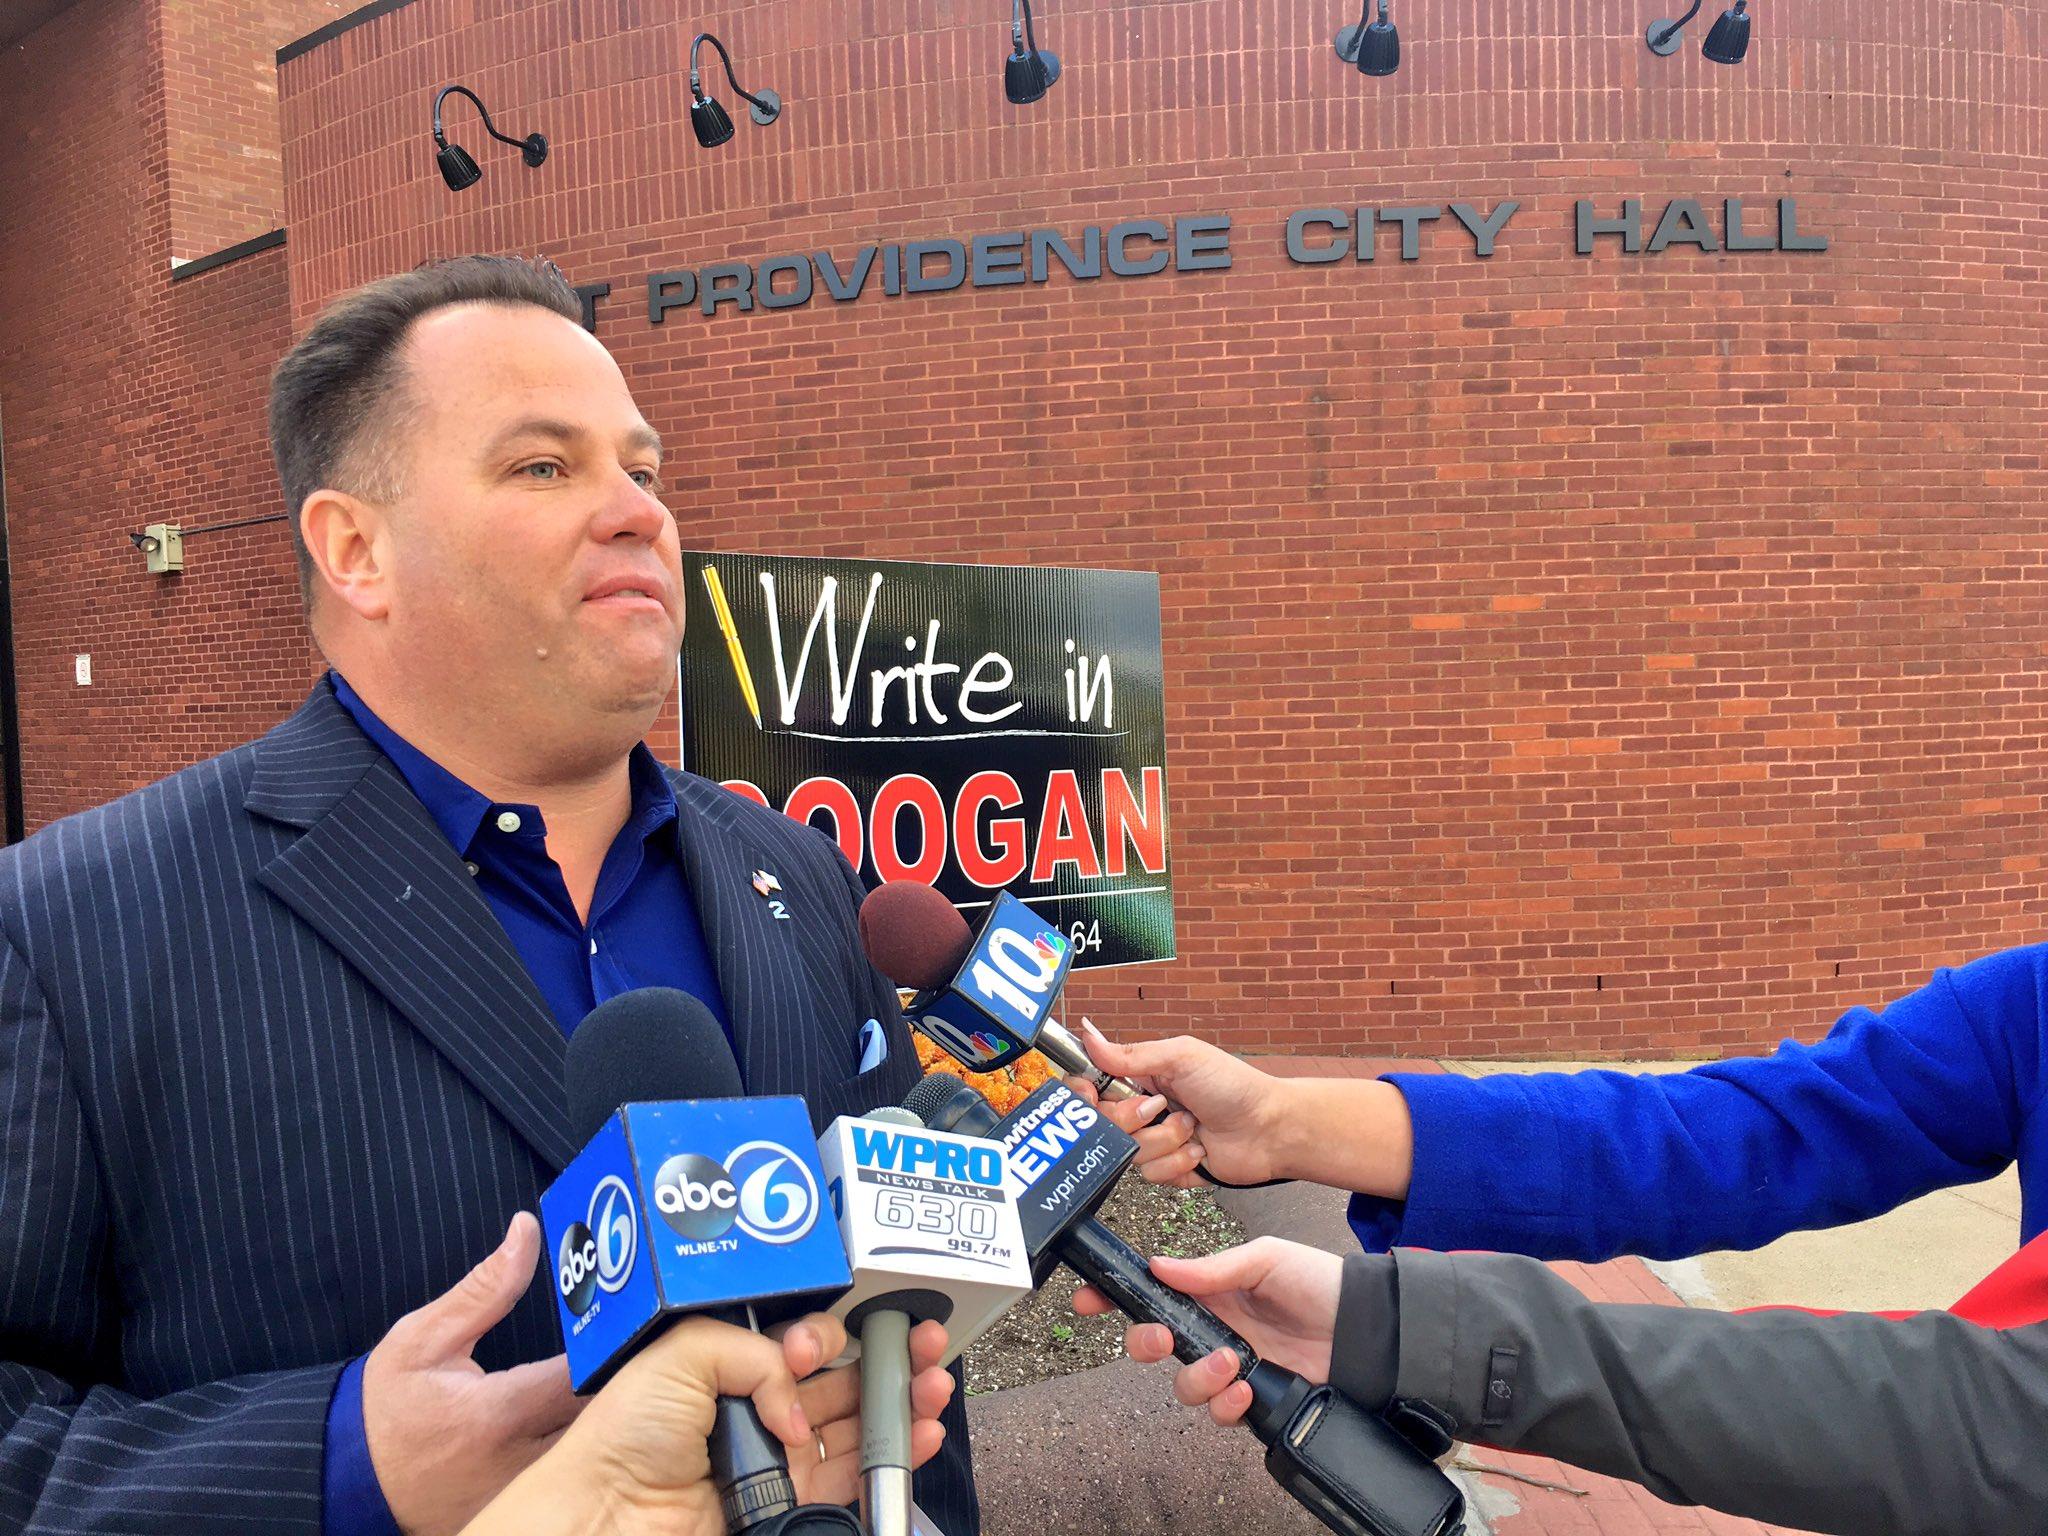 Former Rep. Coogan denies stealing political signs